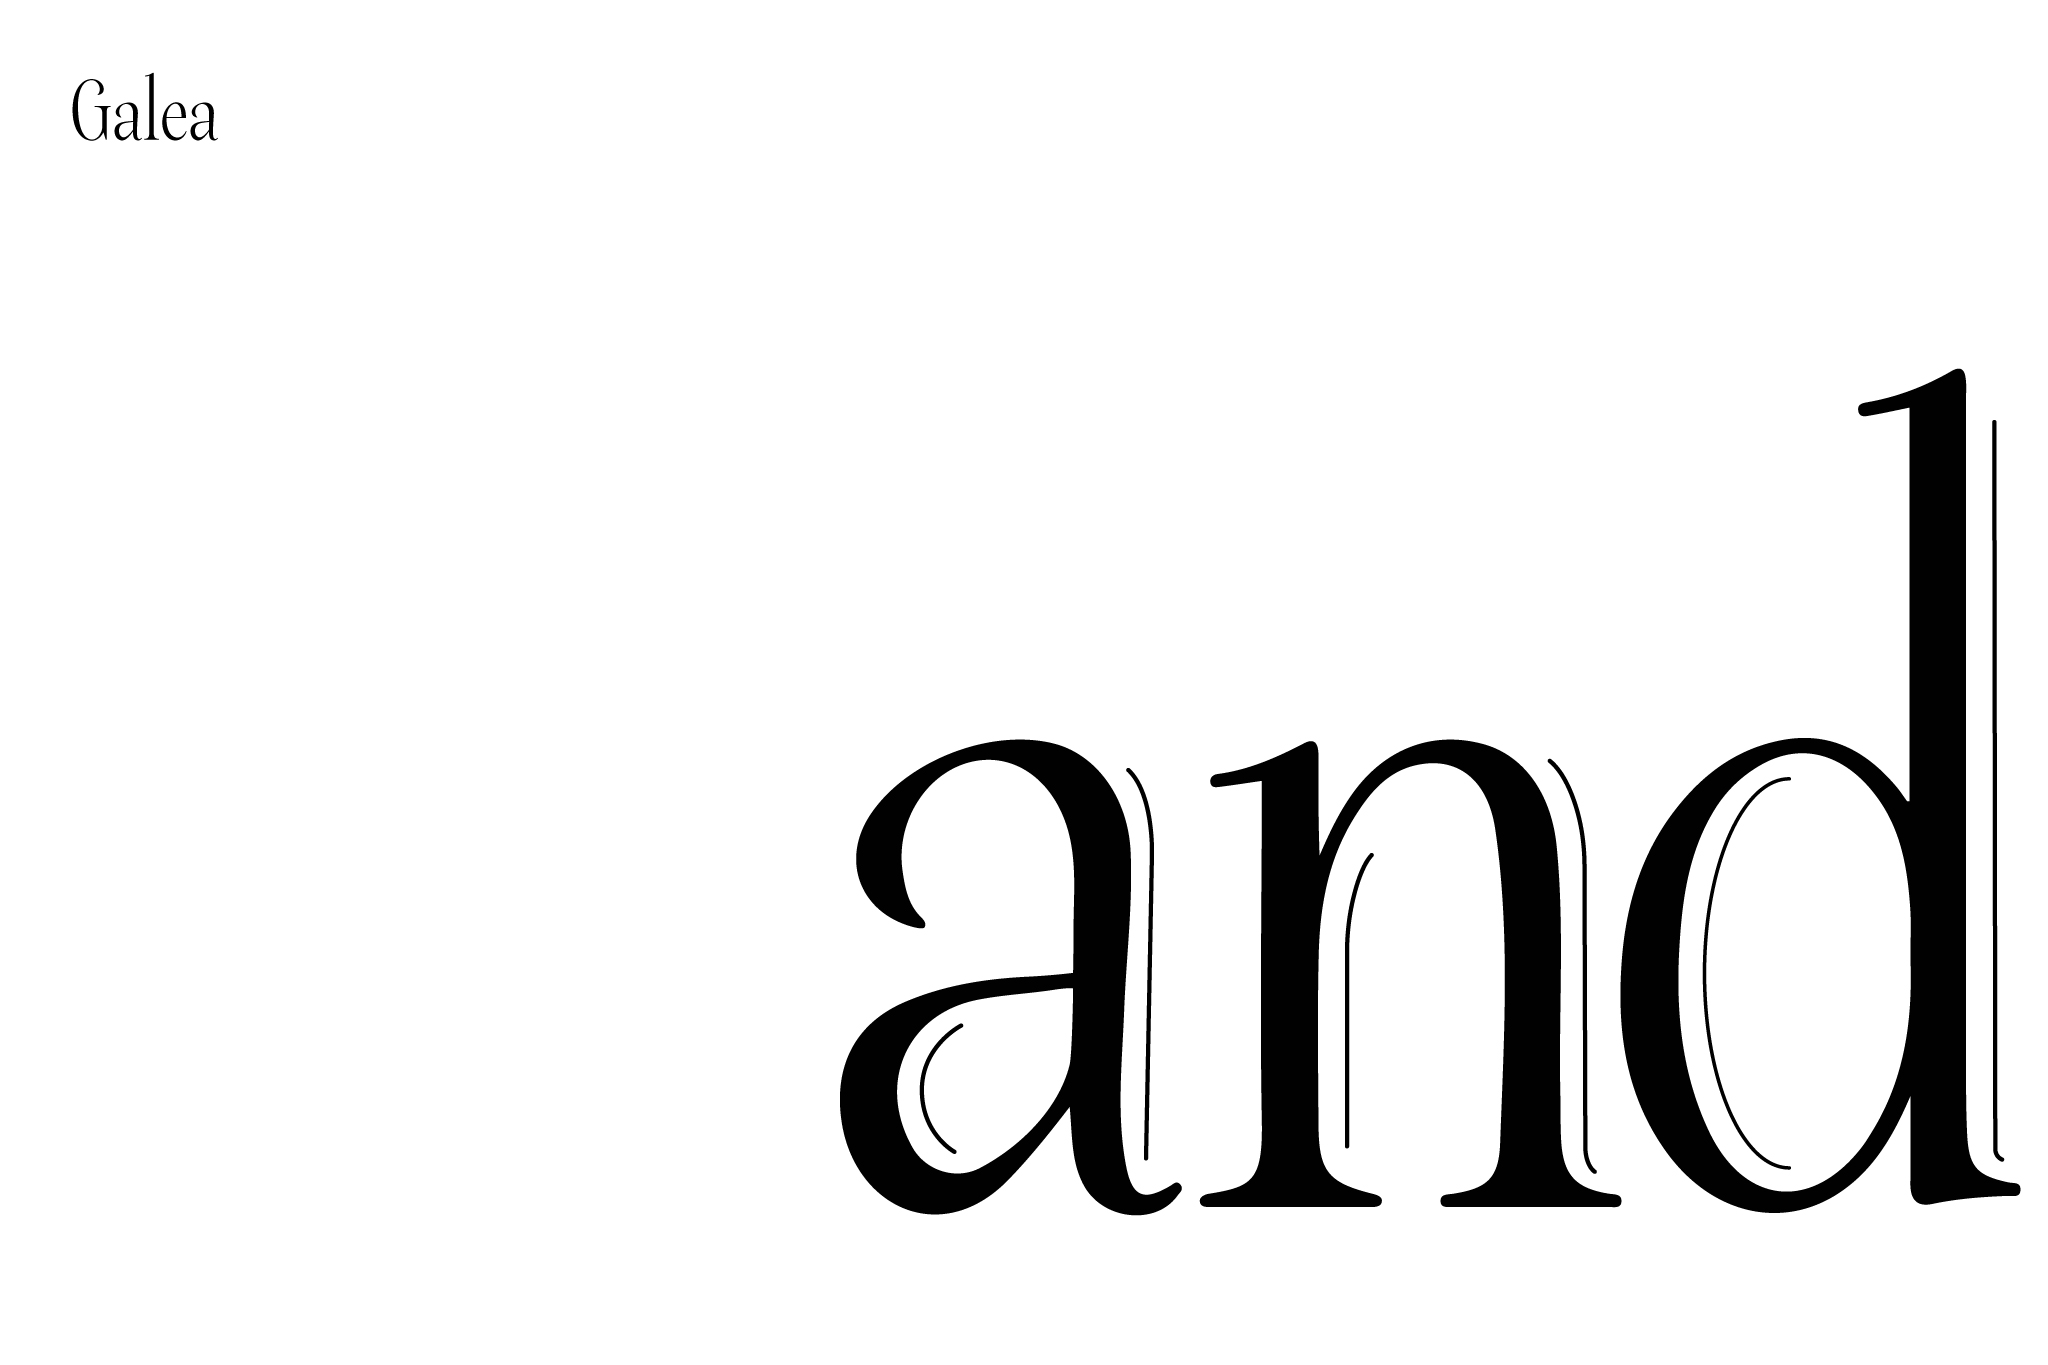 andinc_type_galea